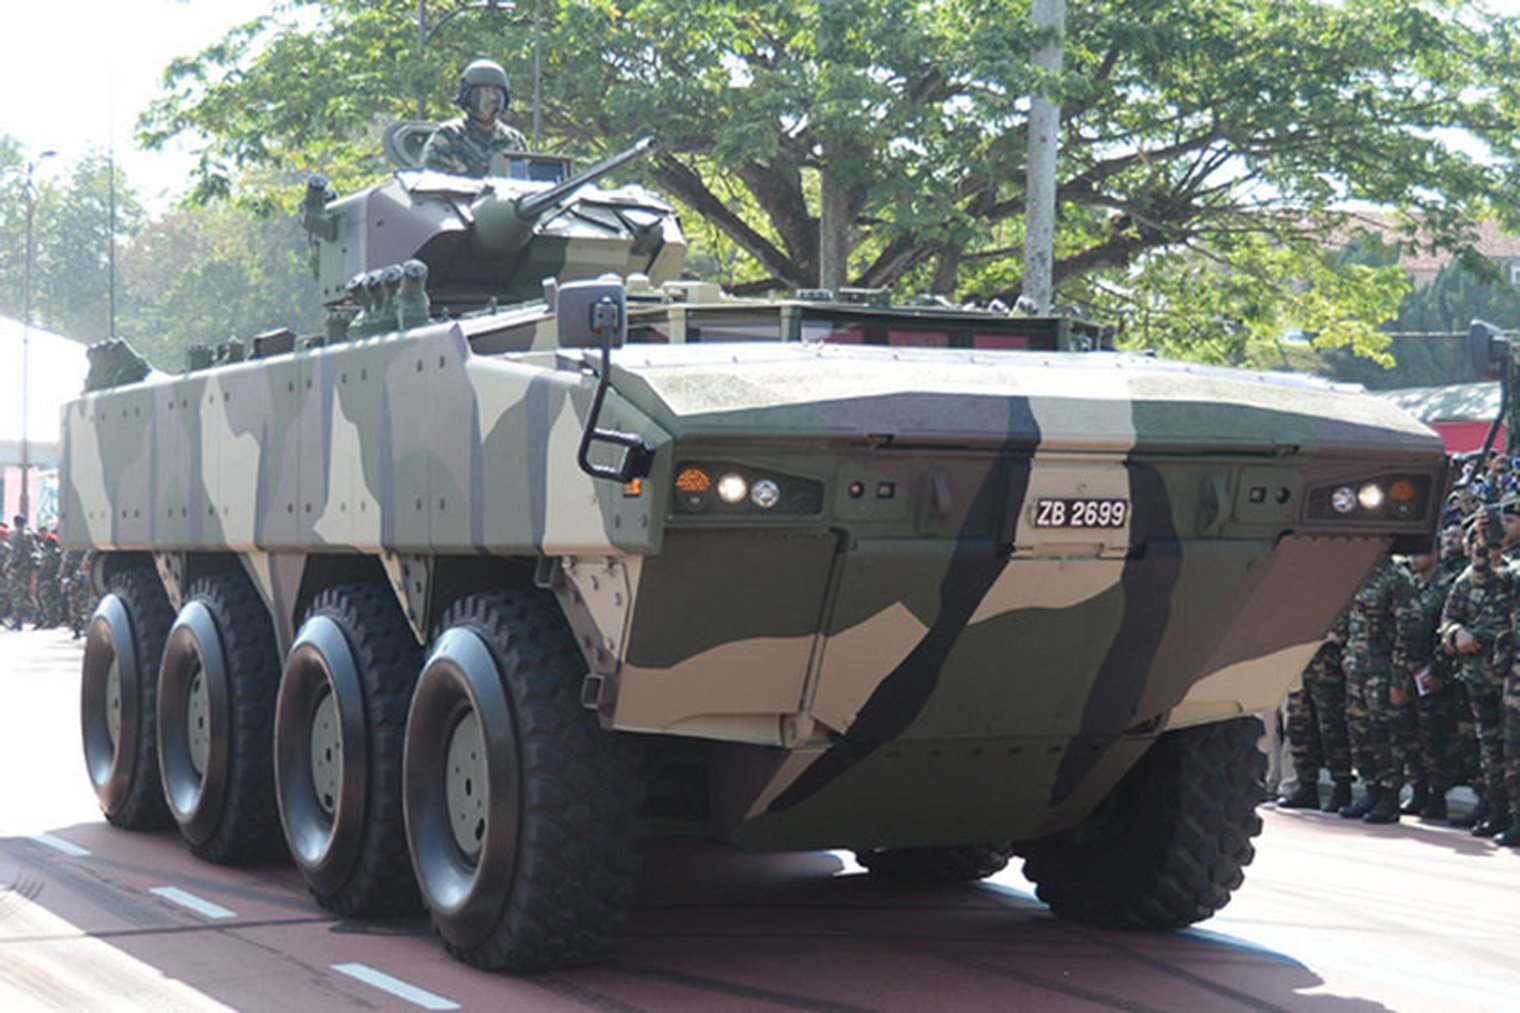 DSA 2018: Malaysian Army awaits new CBRN armoured vehicles - LWI